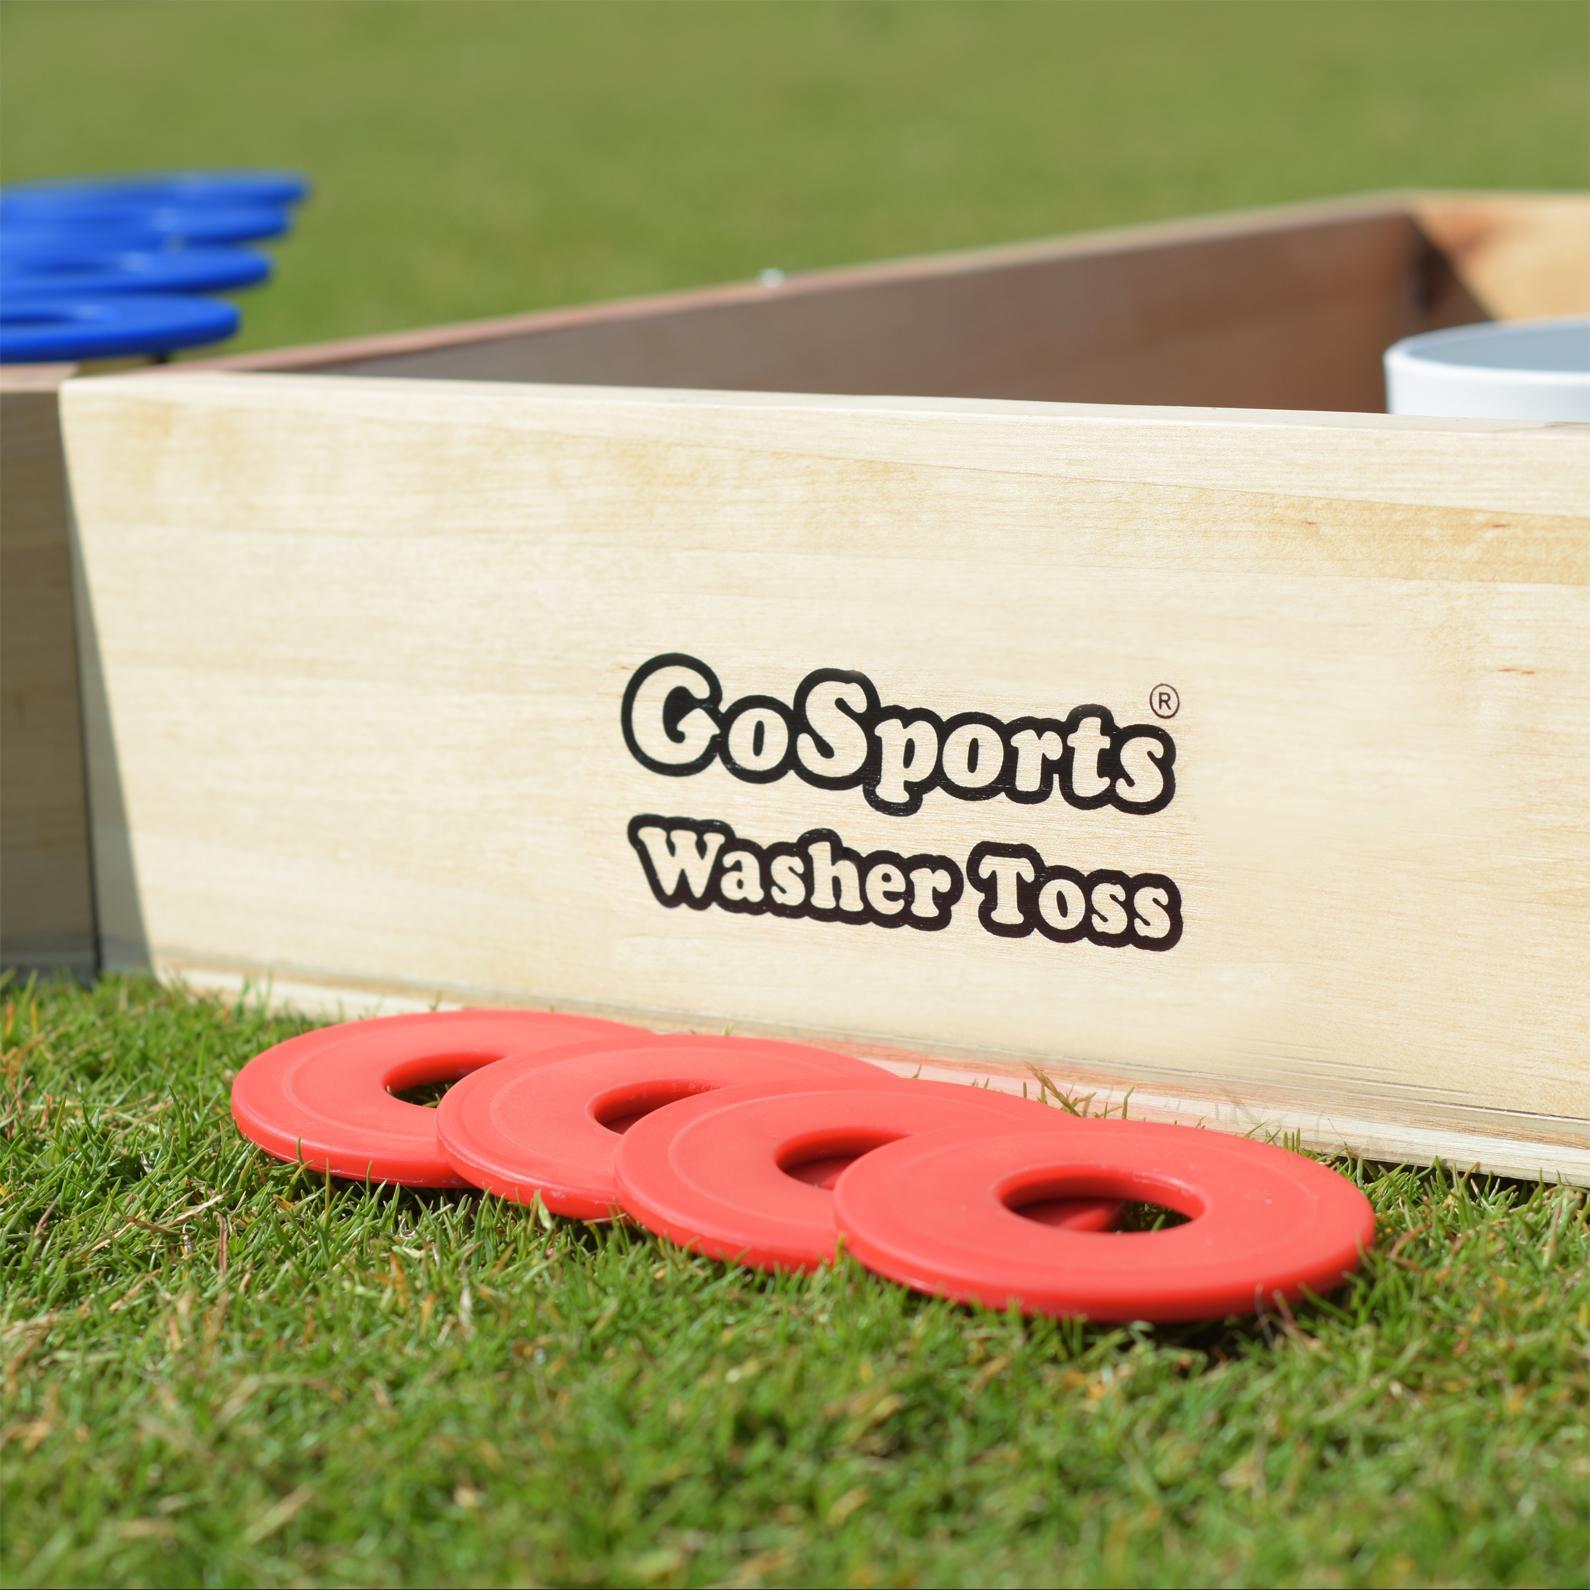 gosports premium birch wood washer toss game games amazon canada